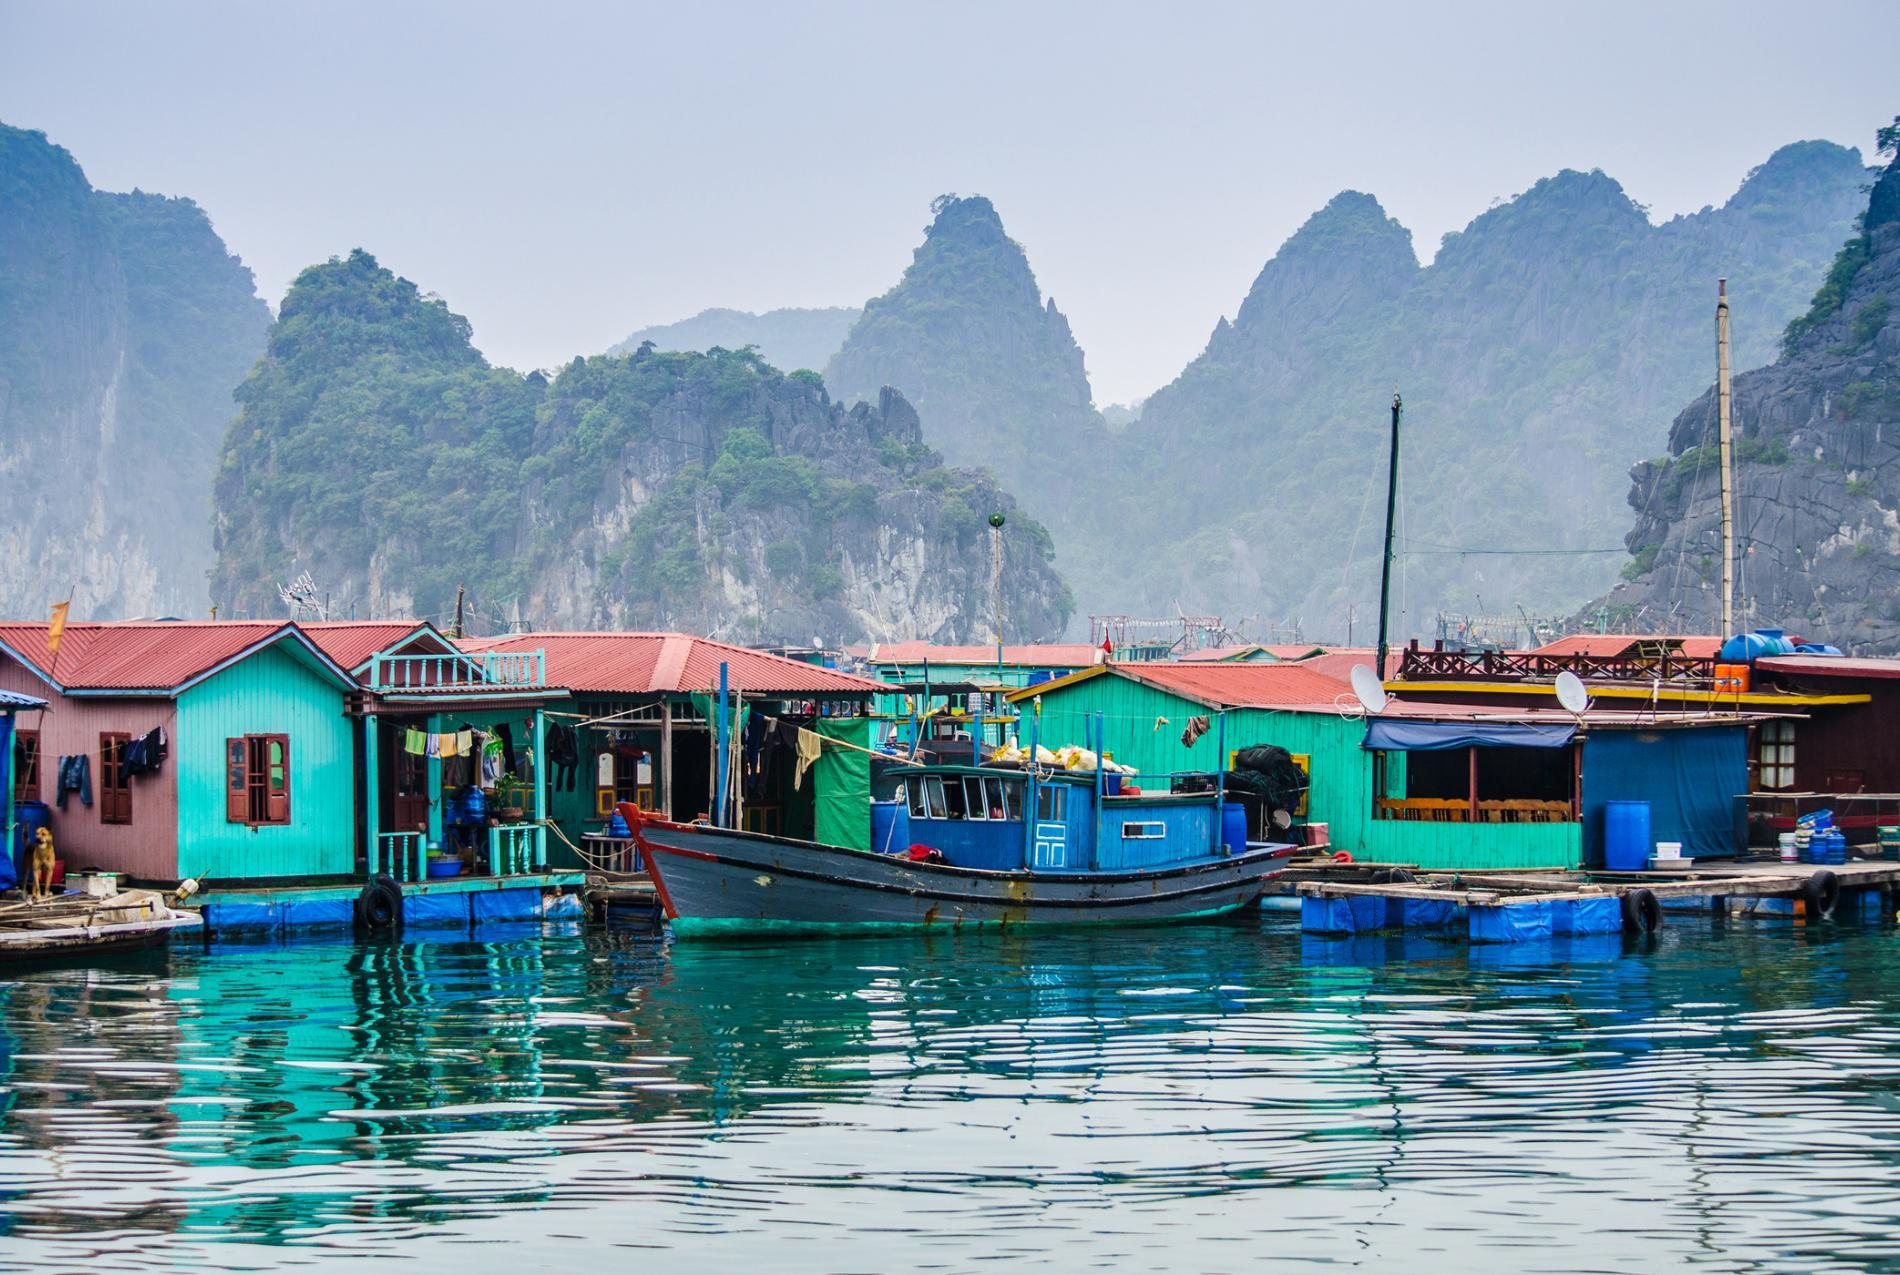 Voyage solidaire Vietnam : Vision du Monde - Photo 8